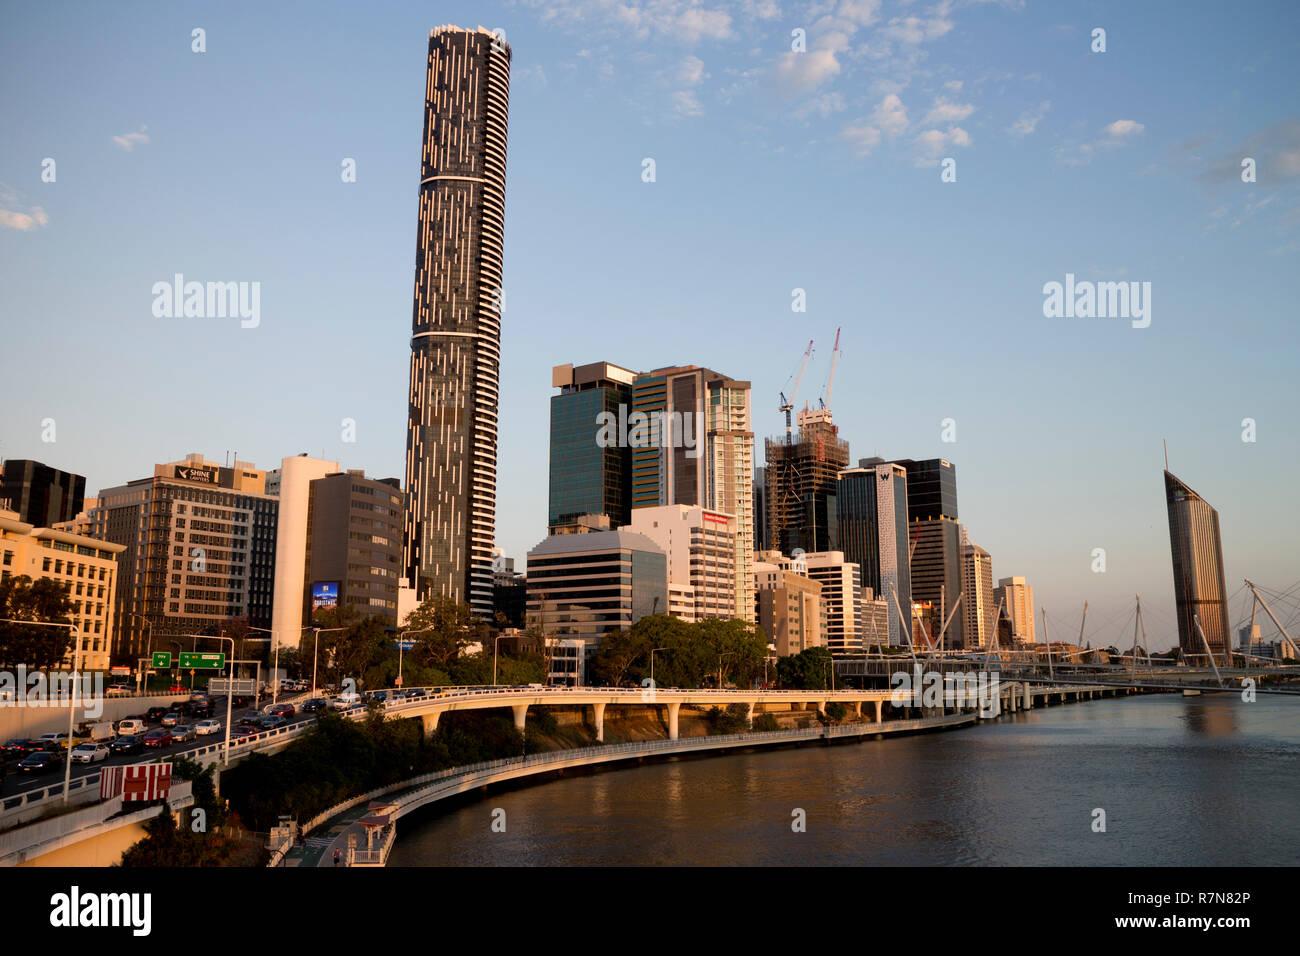 Brisbane city centre and Brisbane River, Queensland, Australia - Stock Image